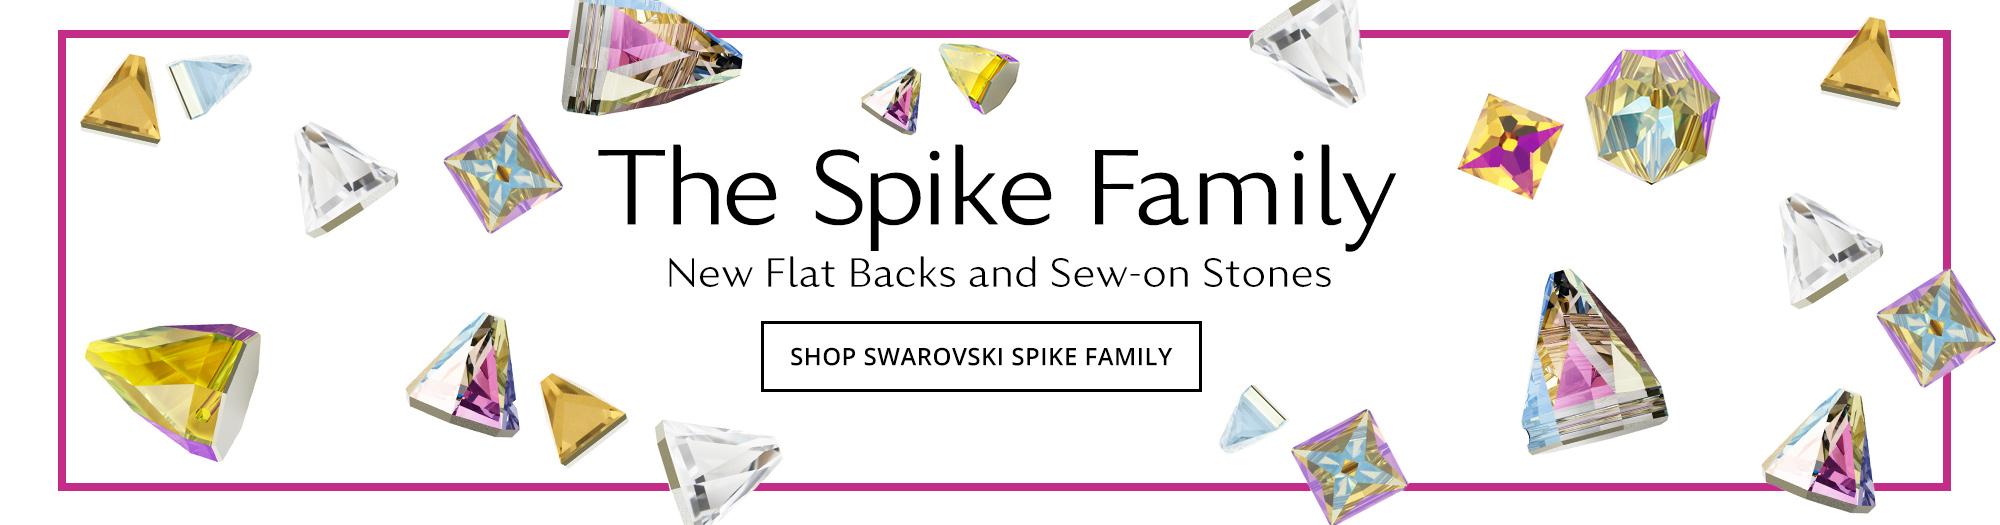 Spike Family